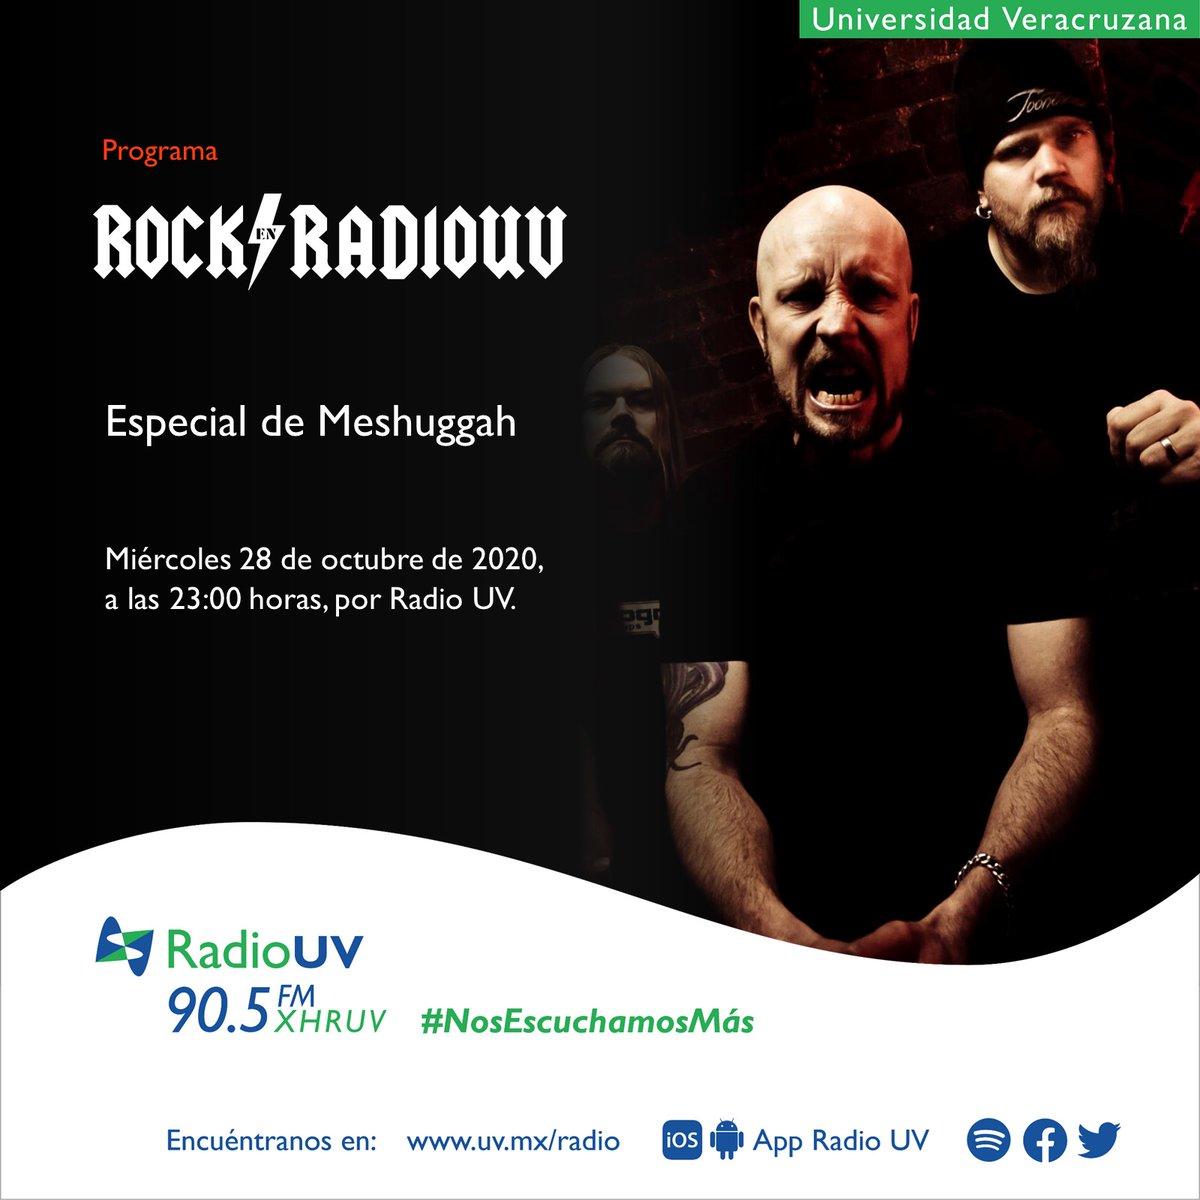 Prepara tus oídos para el especial de #Meshuggah en #RockEnRadioUV 🎸. ¡No te pierdas la transmisión el próximo miércoles 28 de octubre a las 23:00 h!  Escucha el 90.5 FM o en línea: https://t.co/WfczY0S4Qx https://t.co/tlsMb1CXDT